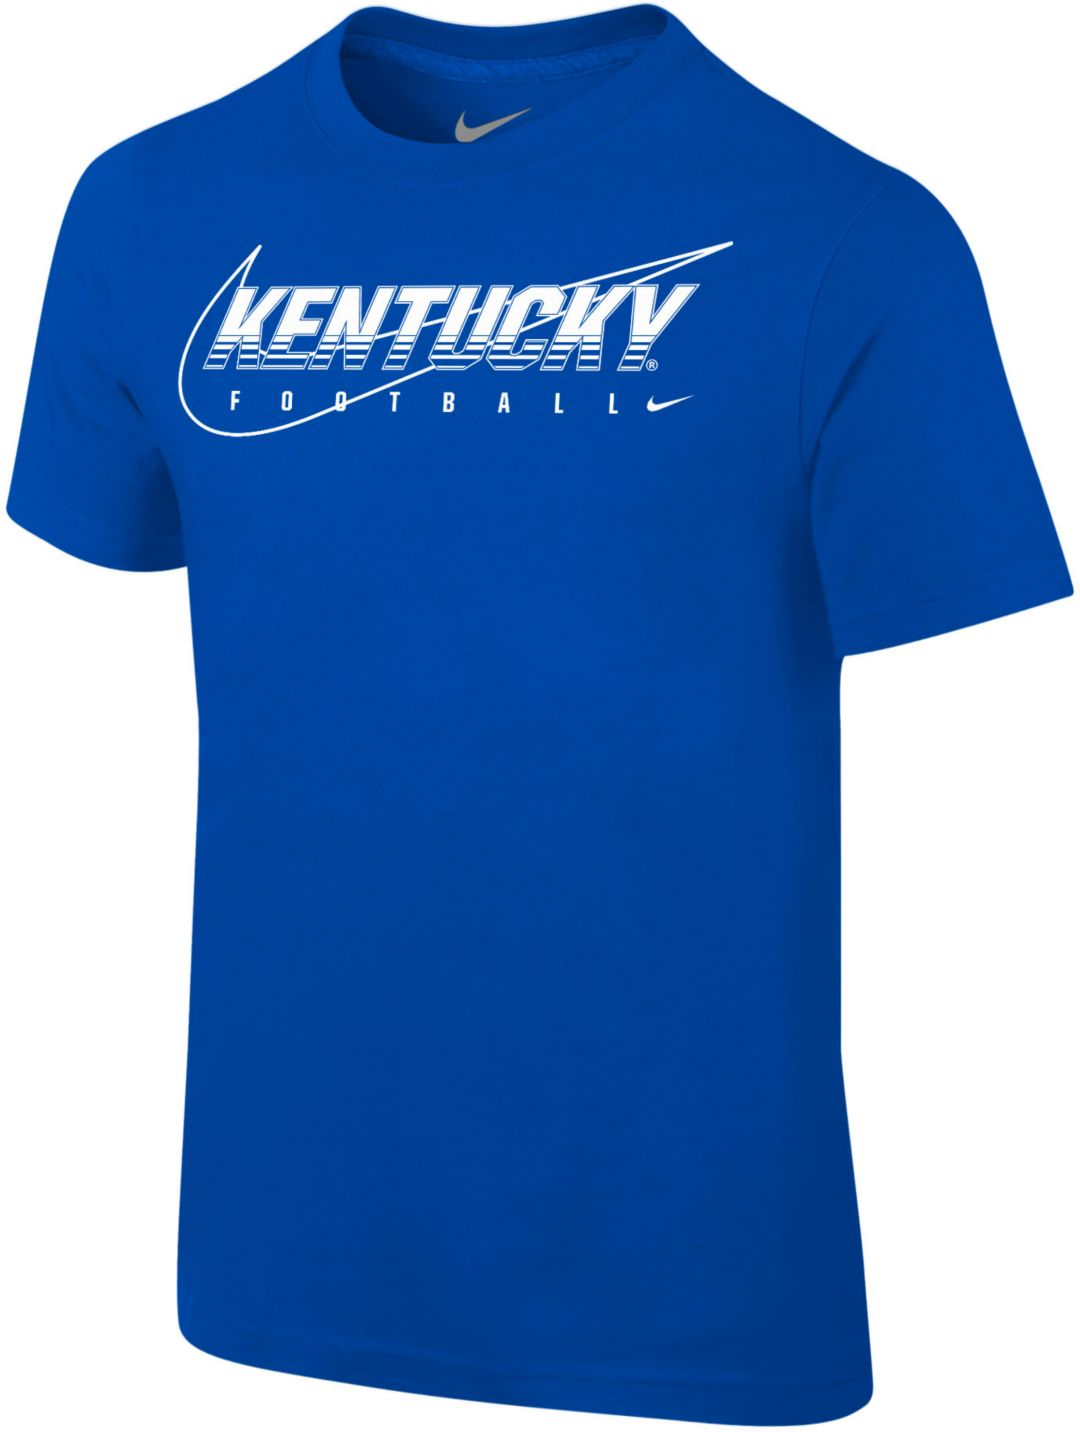 reputable site 3007c 4c665 Nike Youth Kentucky Wildcats Blue Football Dri-FIT Cotton Preschool  Facility T-Shirt